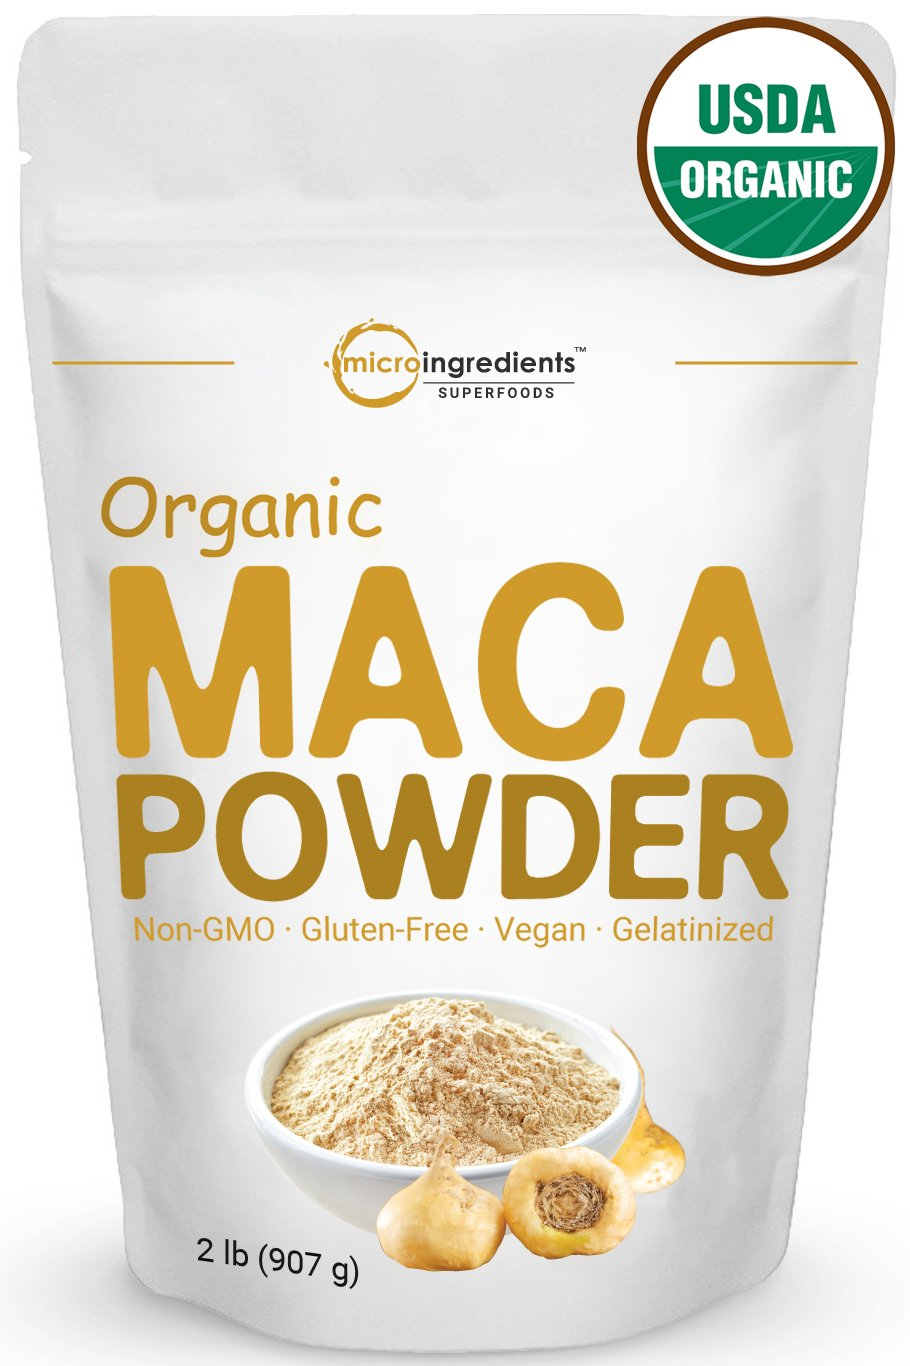 Peruvian Organic Maca Powder, 32 Ounce, Gelatinized for Powerful Bio-Availability, Libido and Energy Booster. Non-Irradiated, Non-Contaminated, Non-GMO and Vegan Friendly.